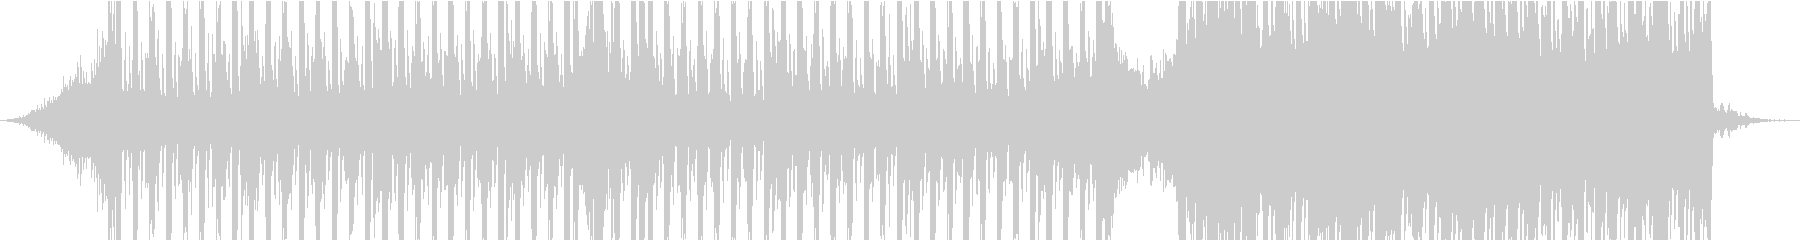 CMプロモーション用のBGMですの未再生の波形